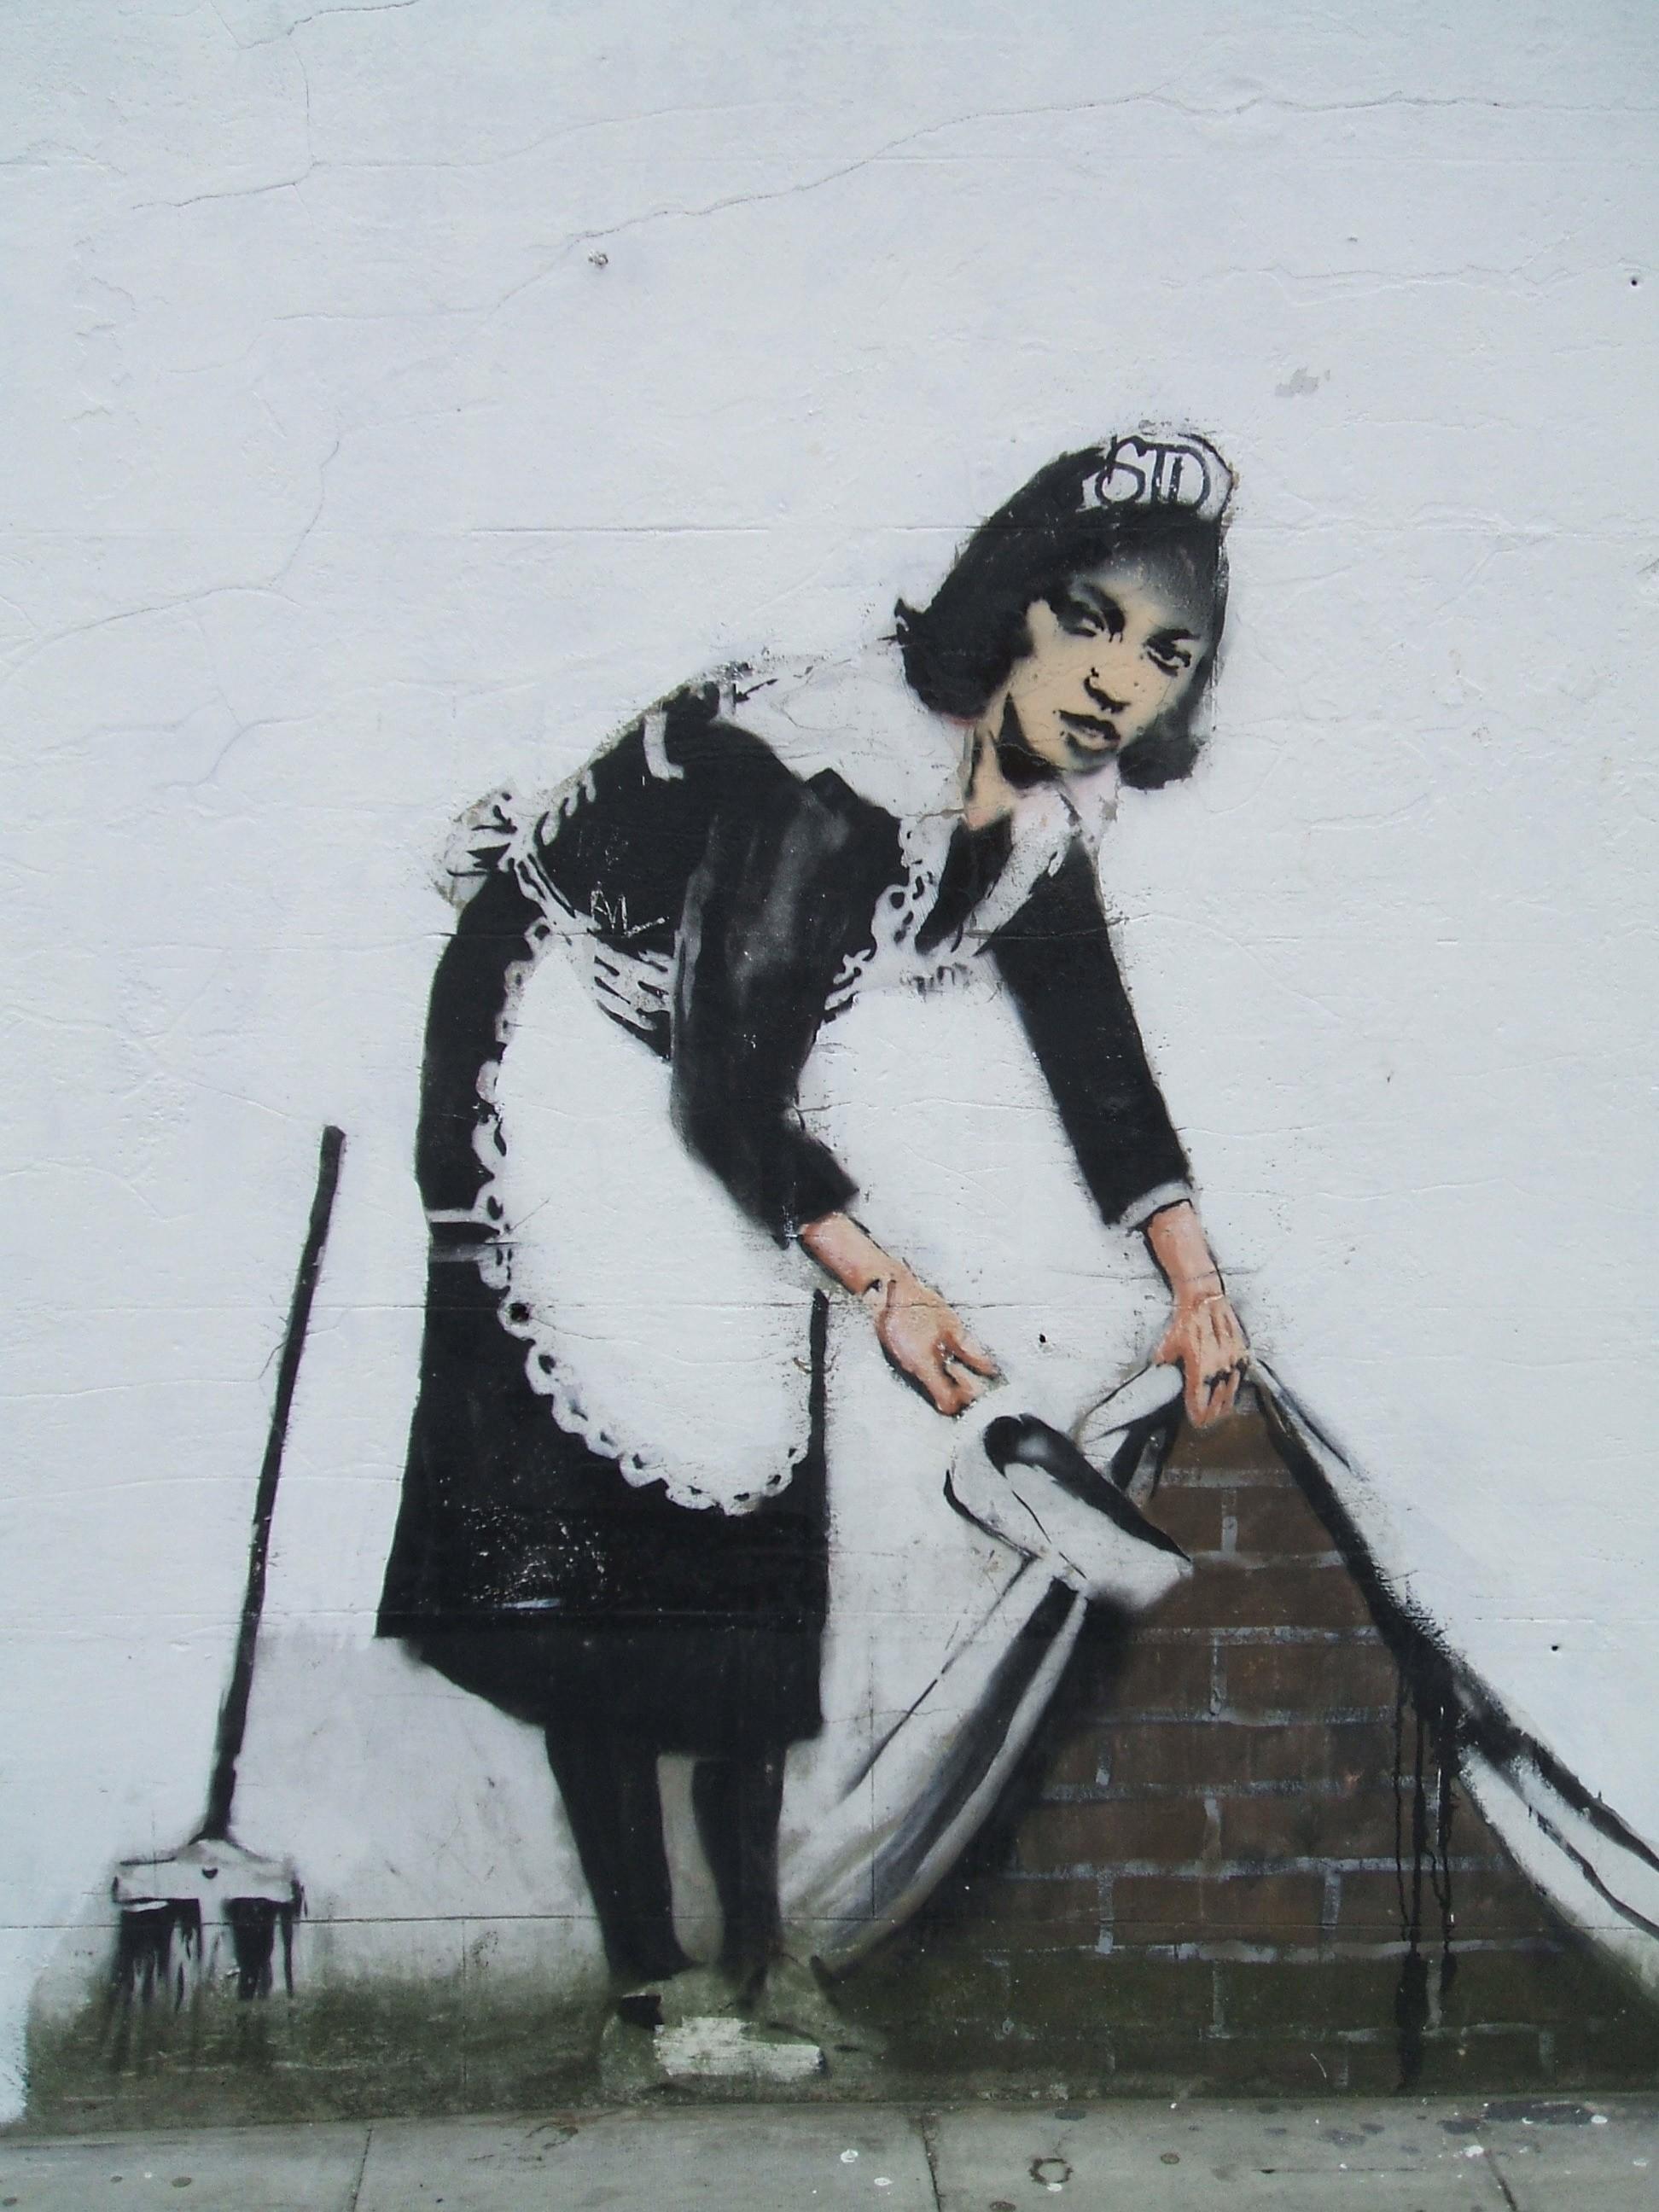 stowers graffiti art essay